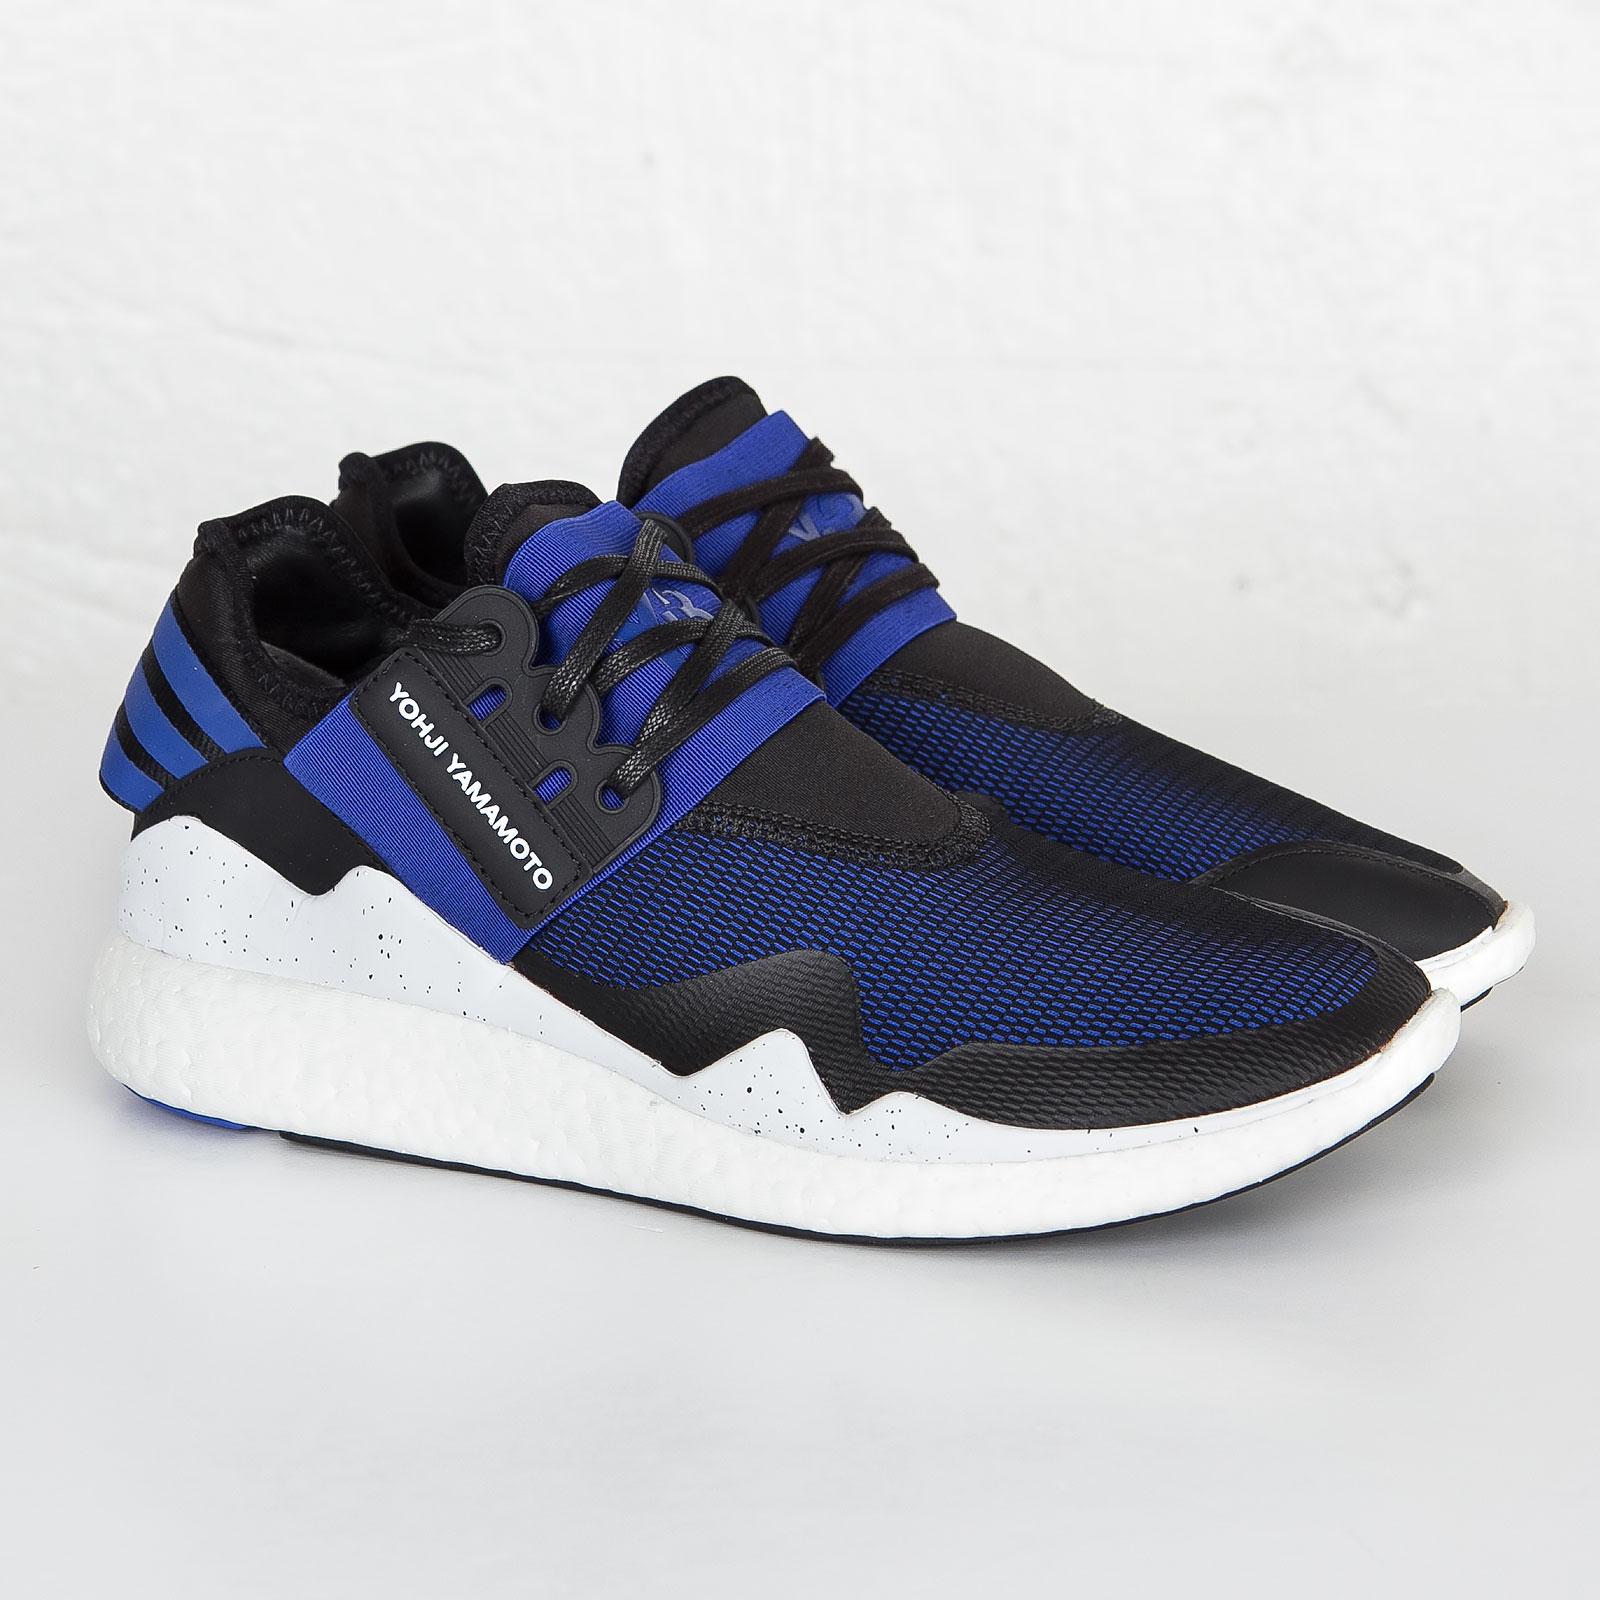 d2706bf4fe74 adidas Y-3 Retro Boost - Aq5494 - Sneakersnstuff